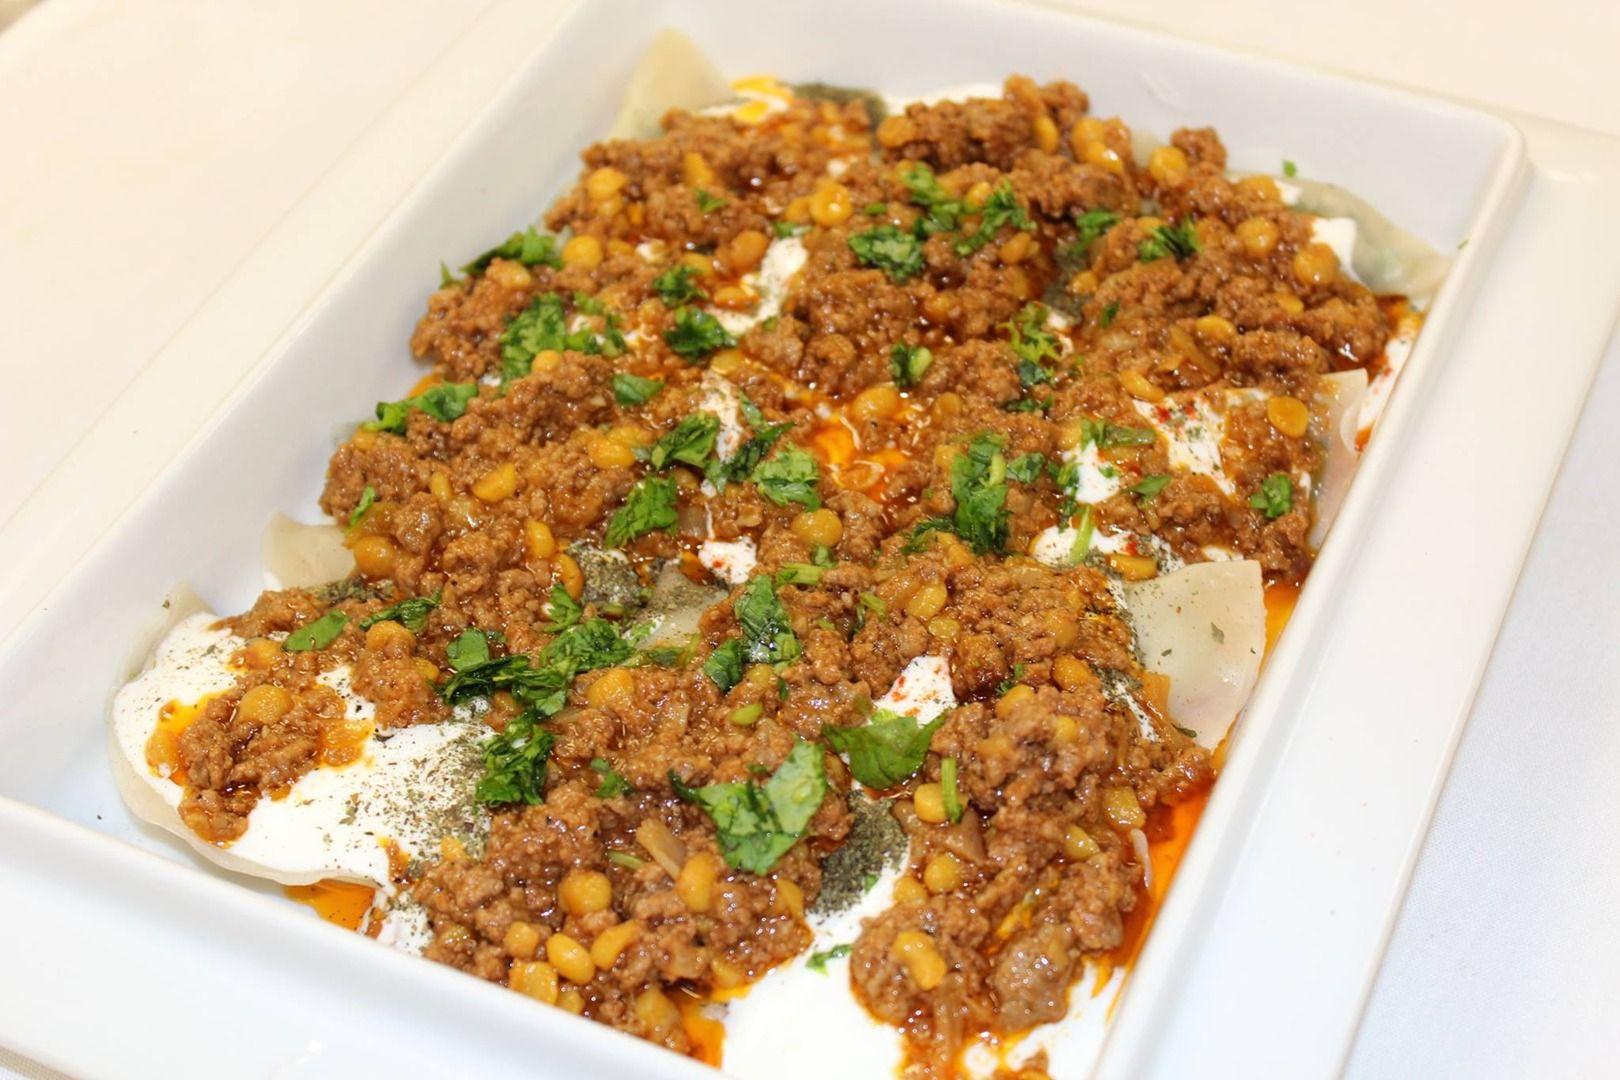 Halal Food Restaurant Montreal Persian Cuisine Mirabel Halal Food Terrebone Persian Cuisine Halal Recipes Food